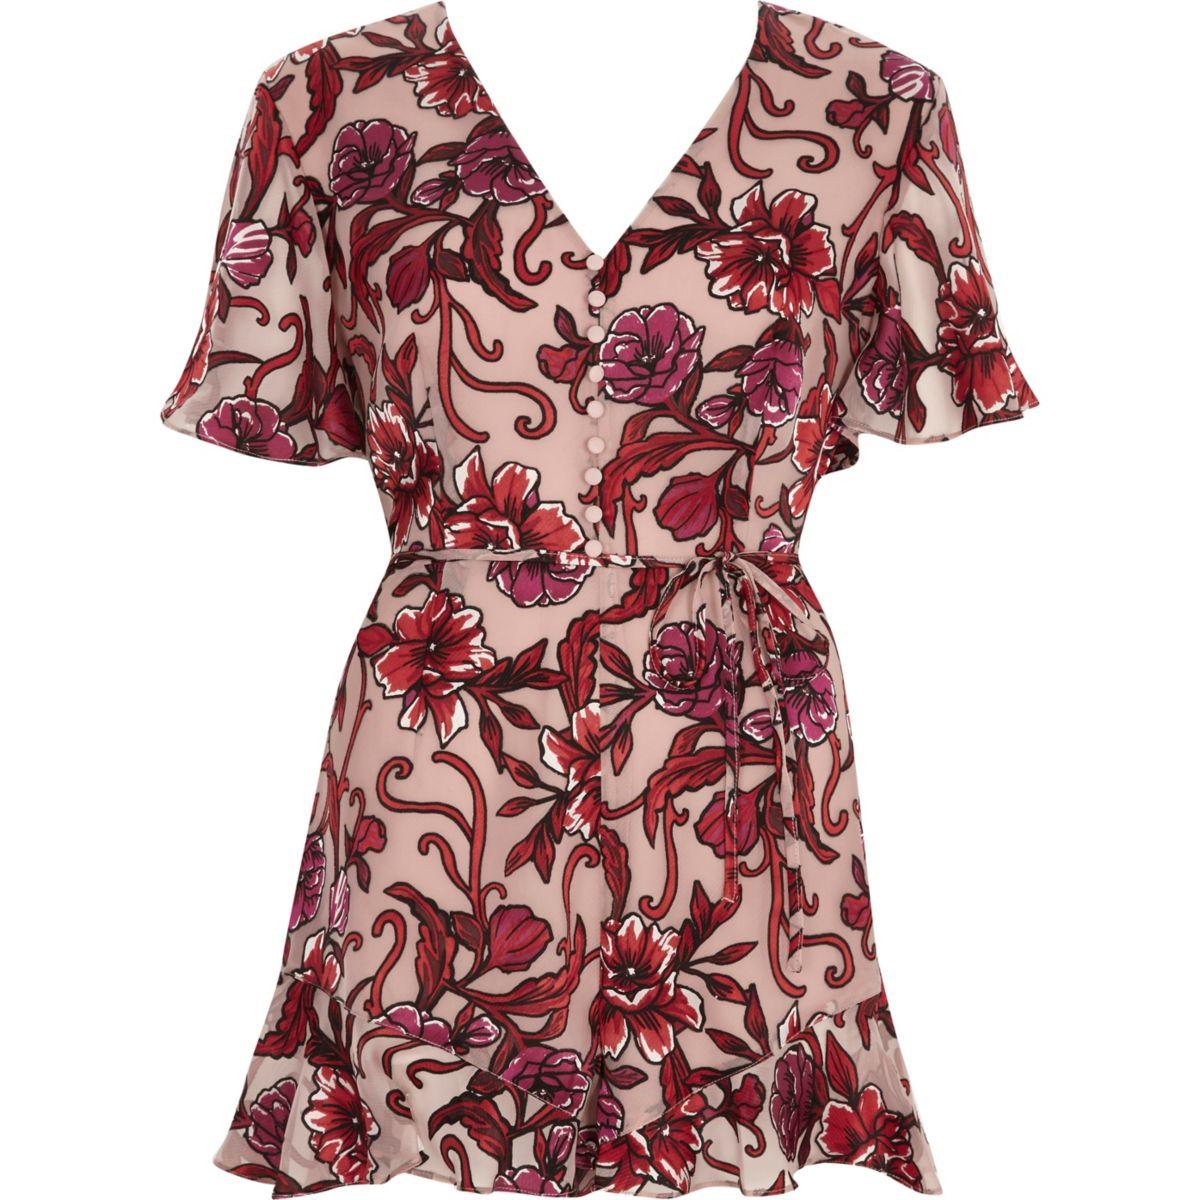 Pink floral devore tea dress style playsuit